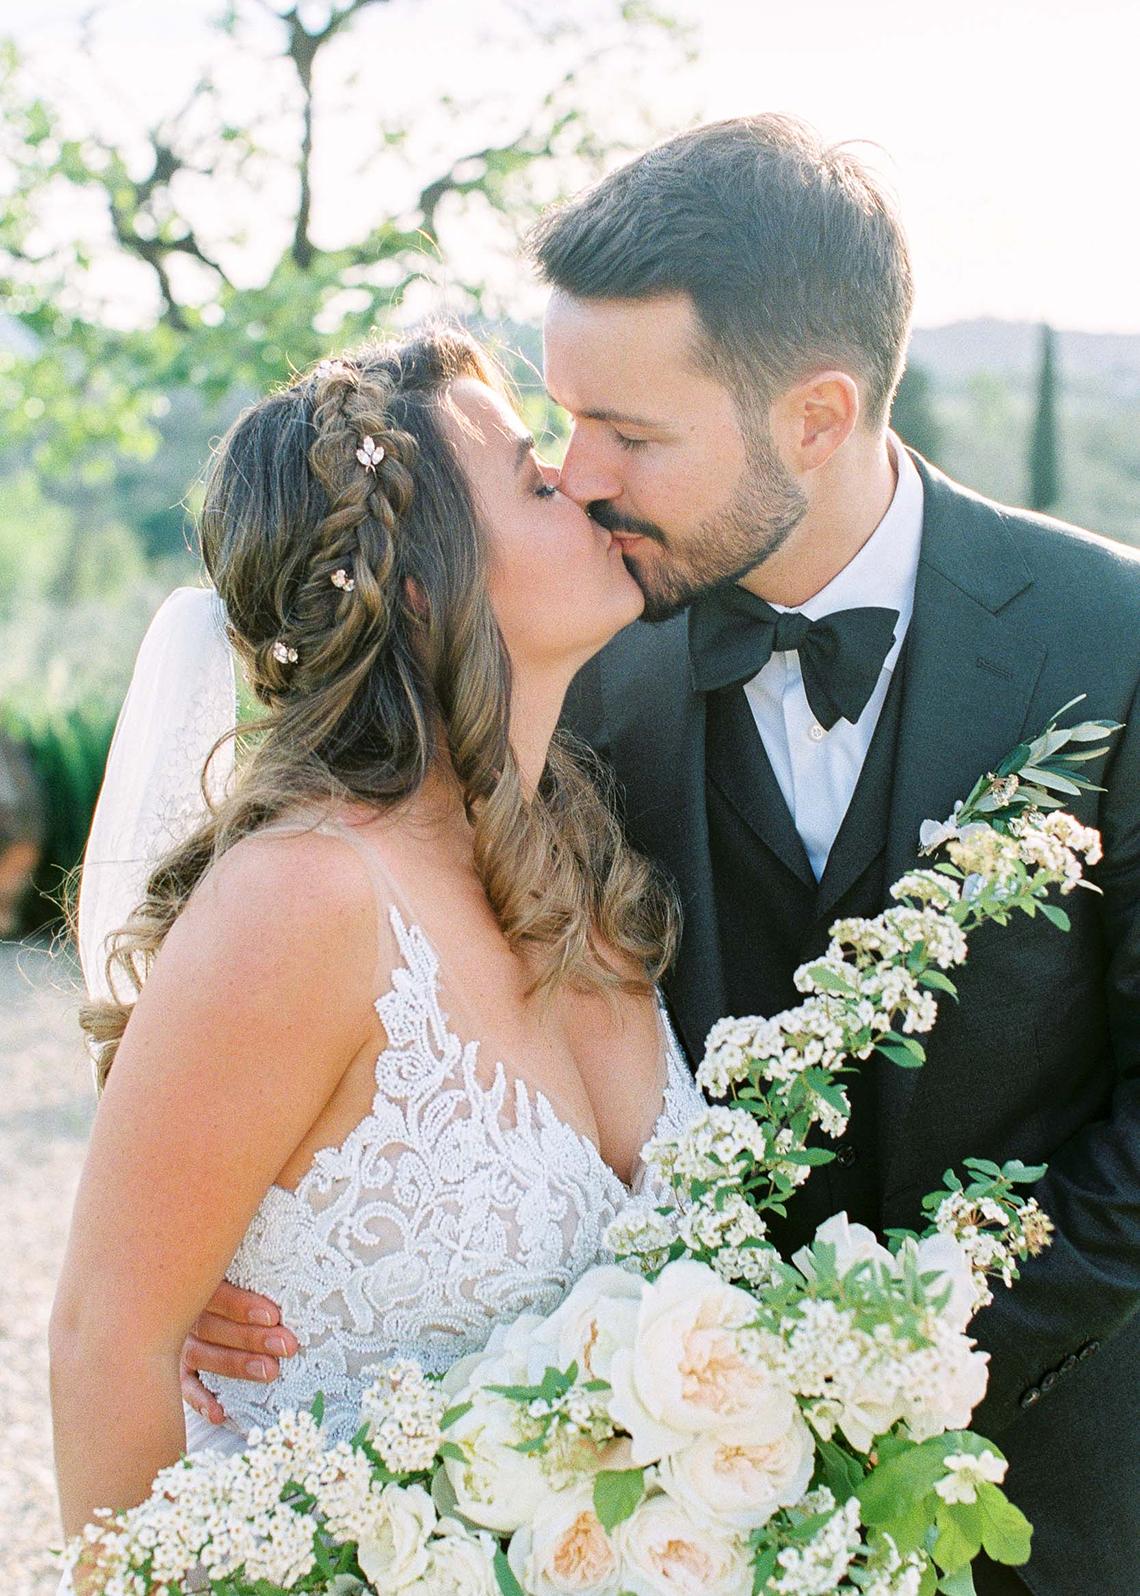 Villa Medicea Tuscany Wedding – Giulia Alessandri Wedding and Event Planner – Kir and Ira Photography 21